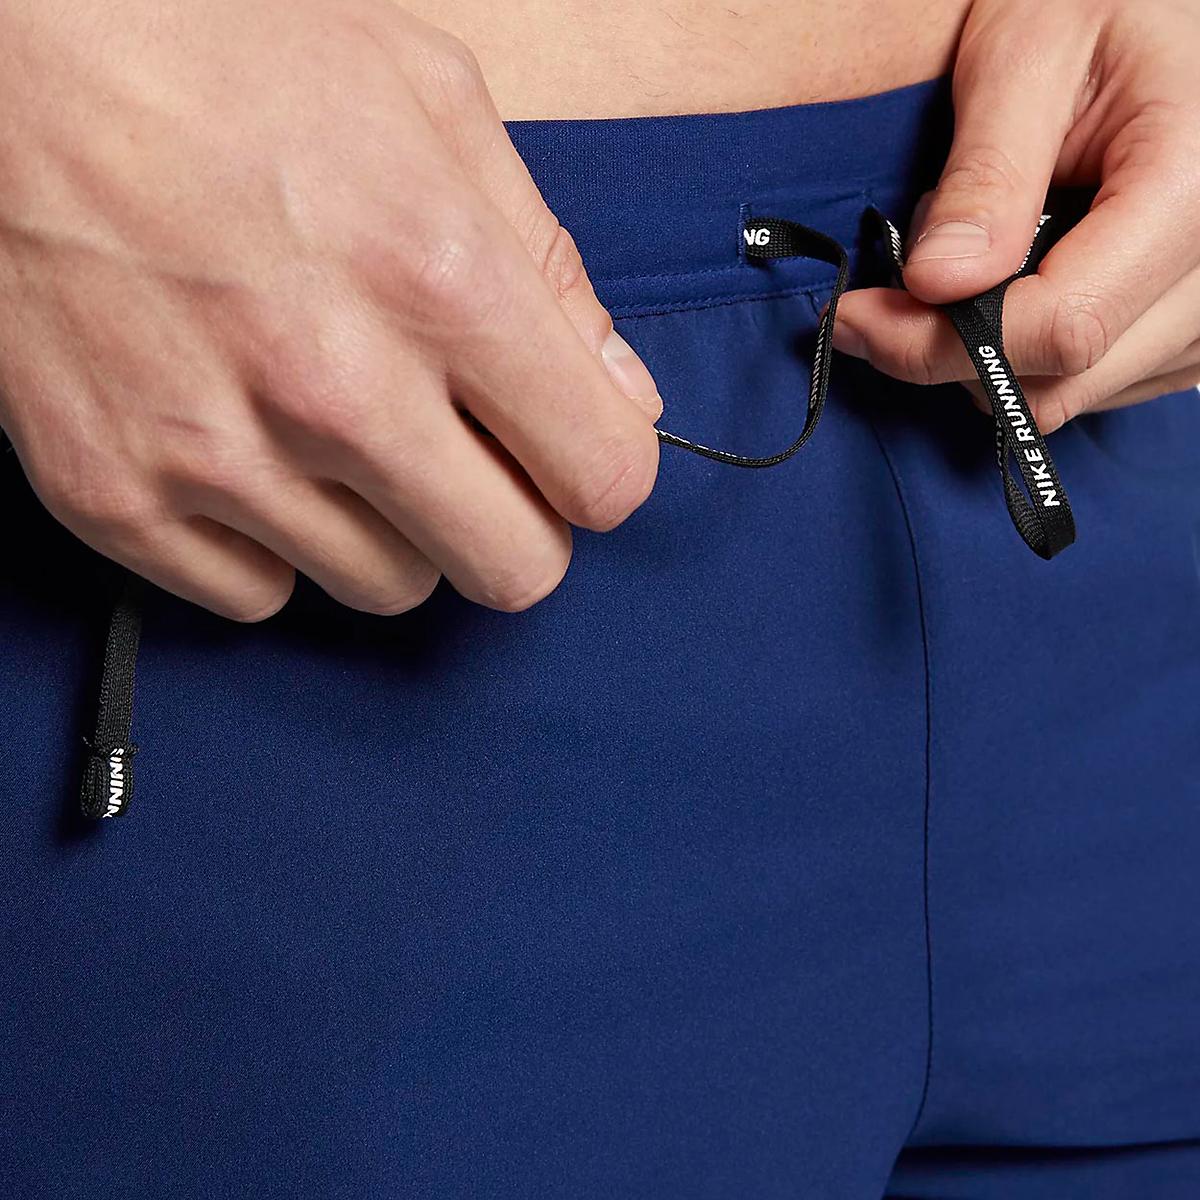 Men's Nike Dri-FIT Flex Stride 7 Inch 2-in-1 Short - Color: Blue Void/Blue Void/Reflective Silver - Size: S, Blue Void/Blue Void/Reflective Silver, large, image 3